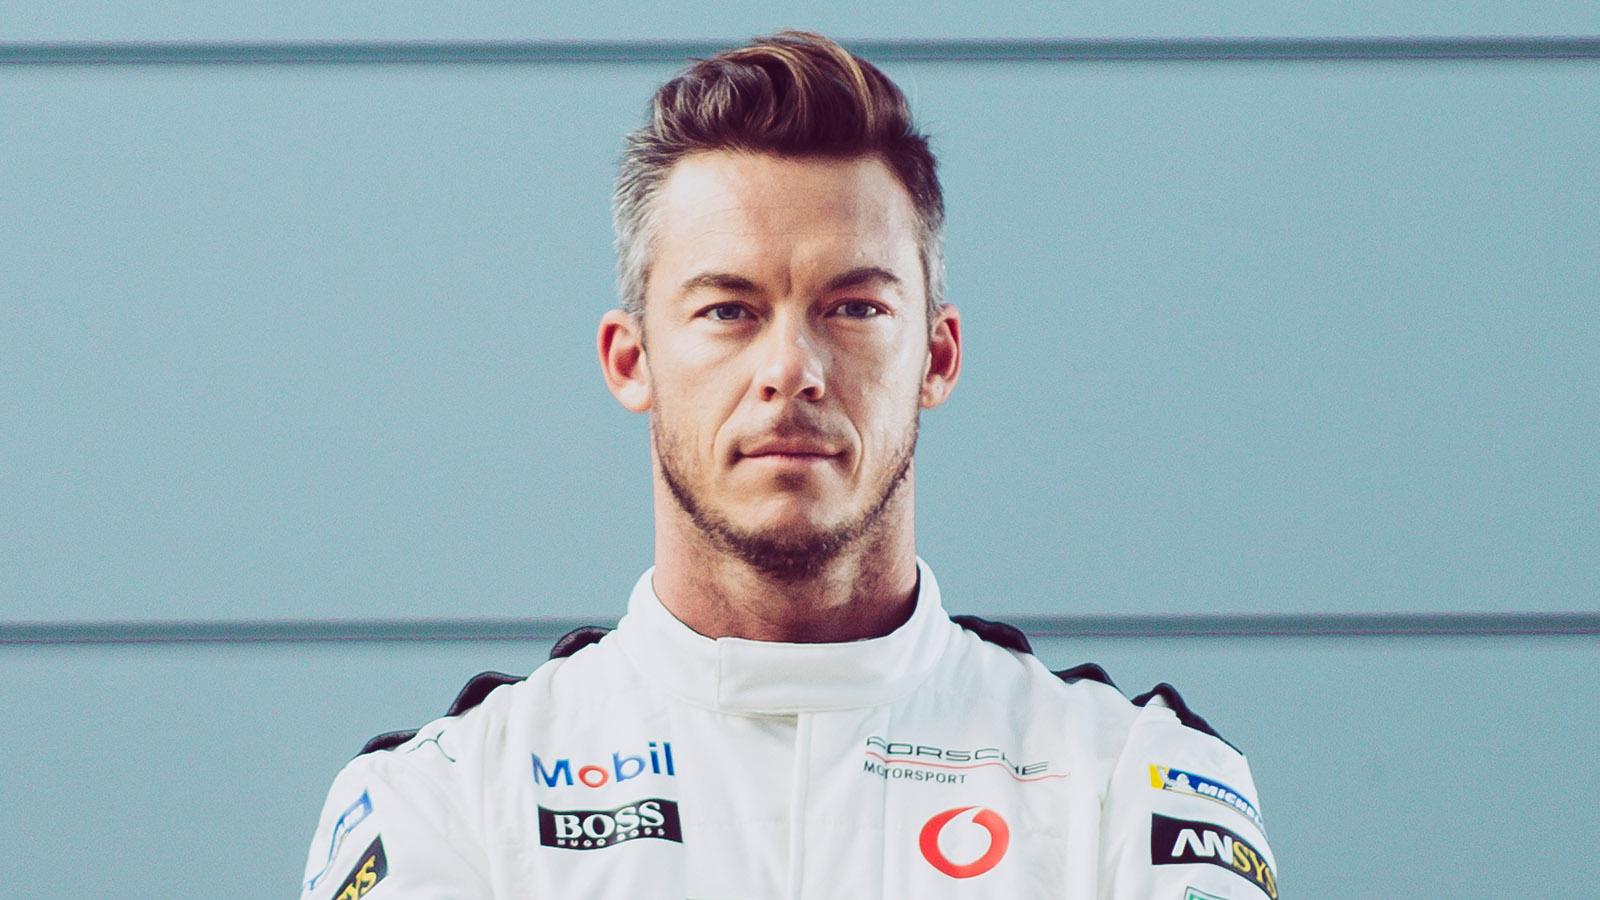 Porsche - André Lotterer (test, development and race driver) GER